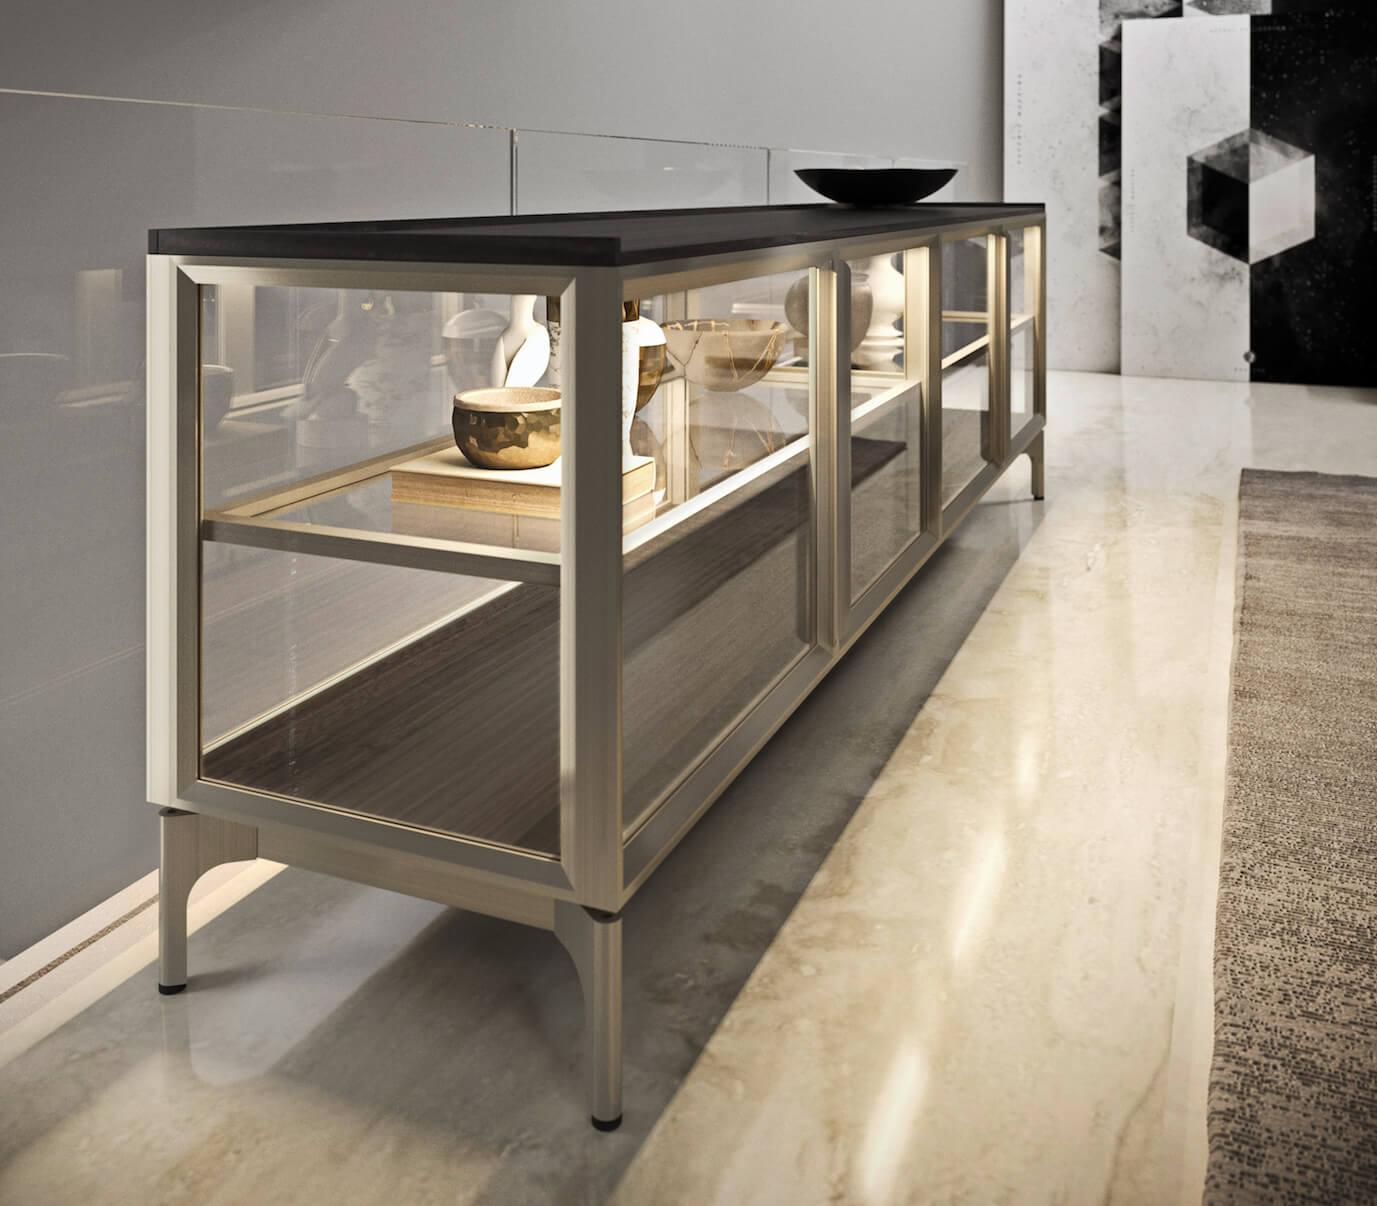 Riquadro Storage System by Snaidero